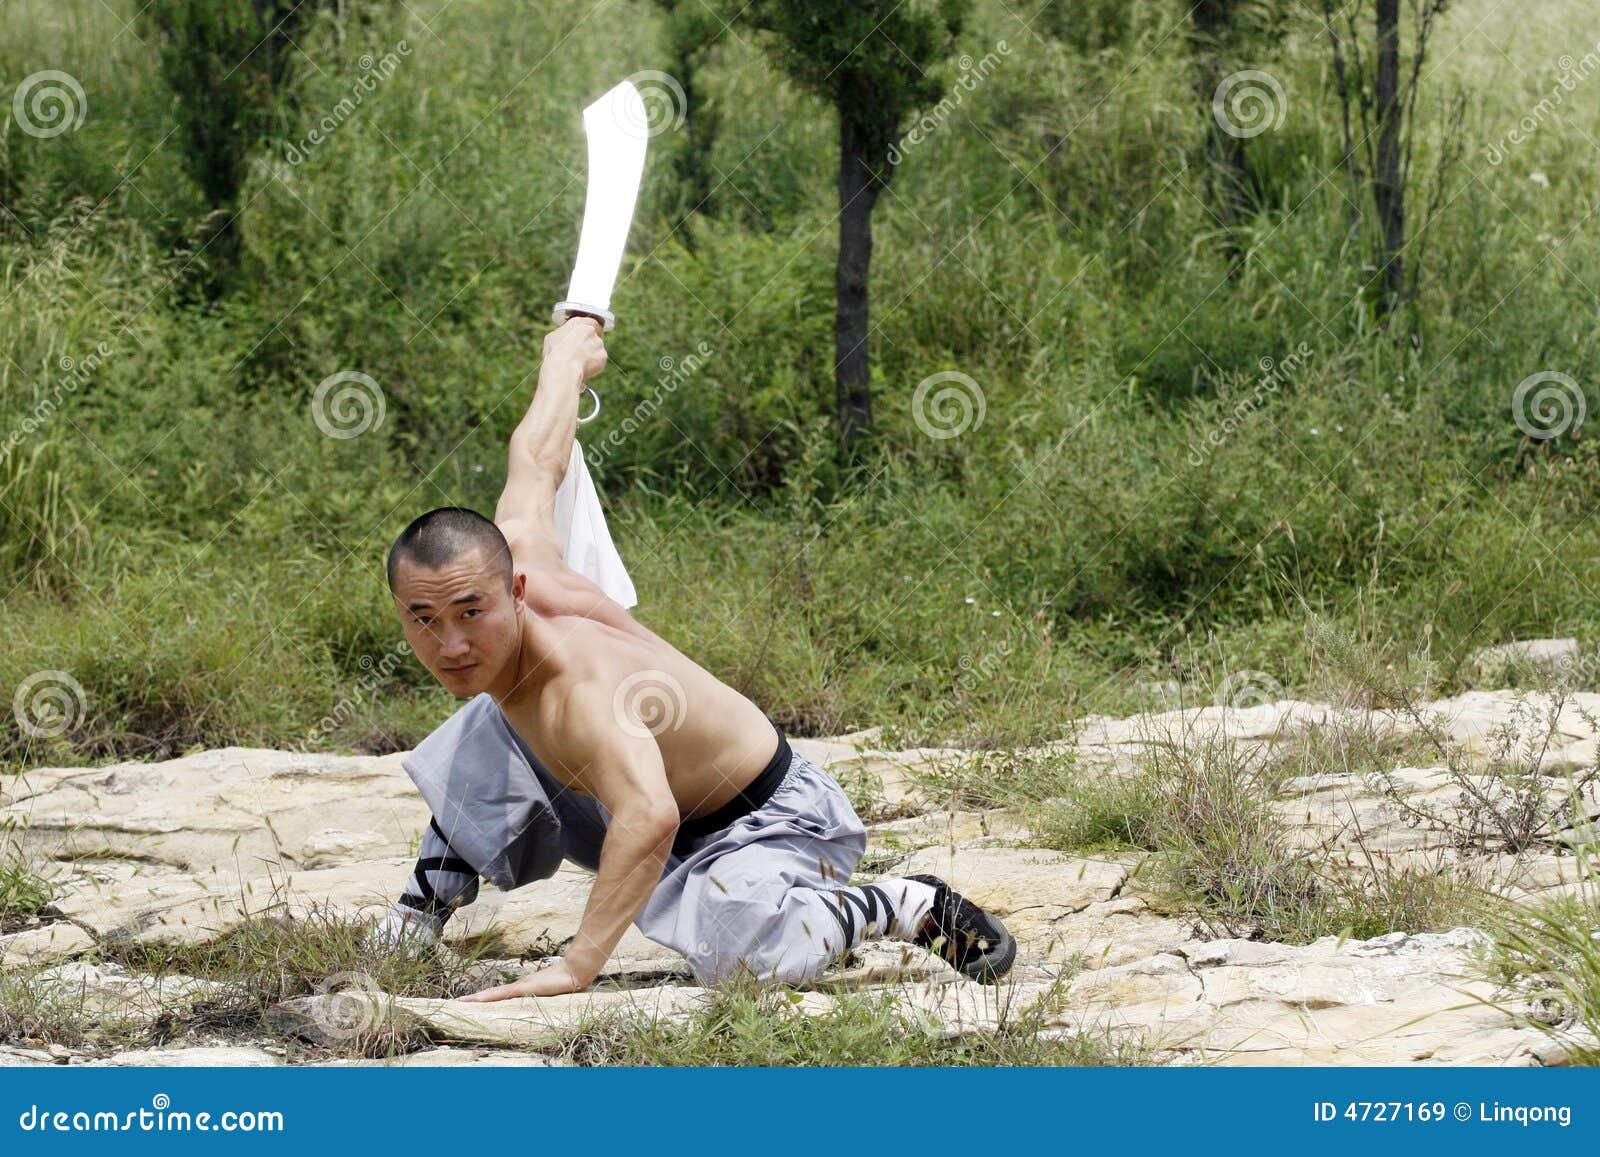 Artes marciais?.broadsword.